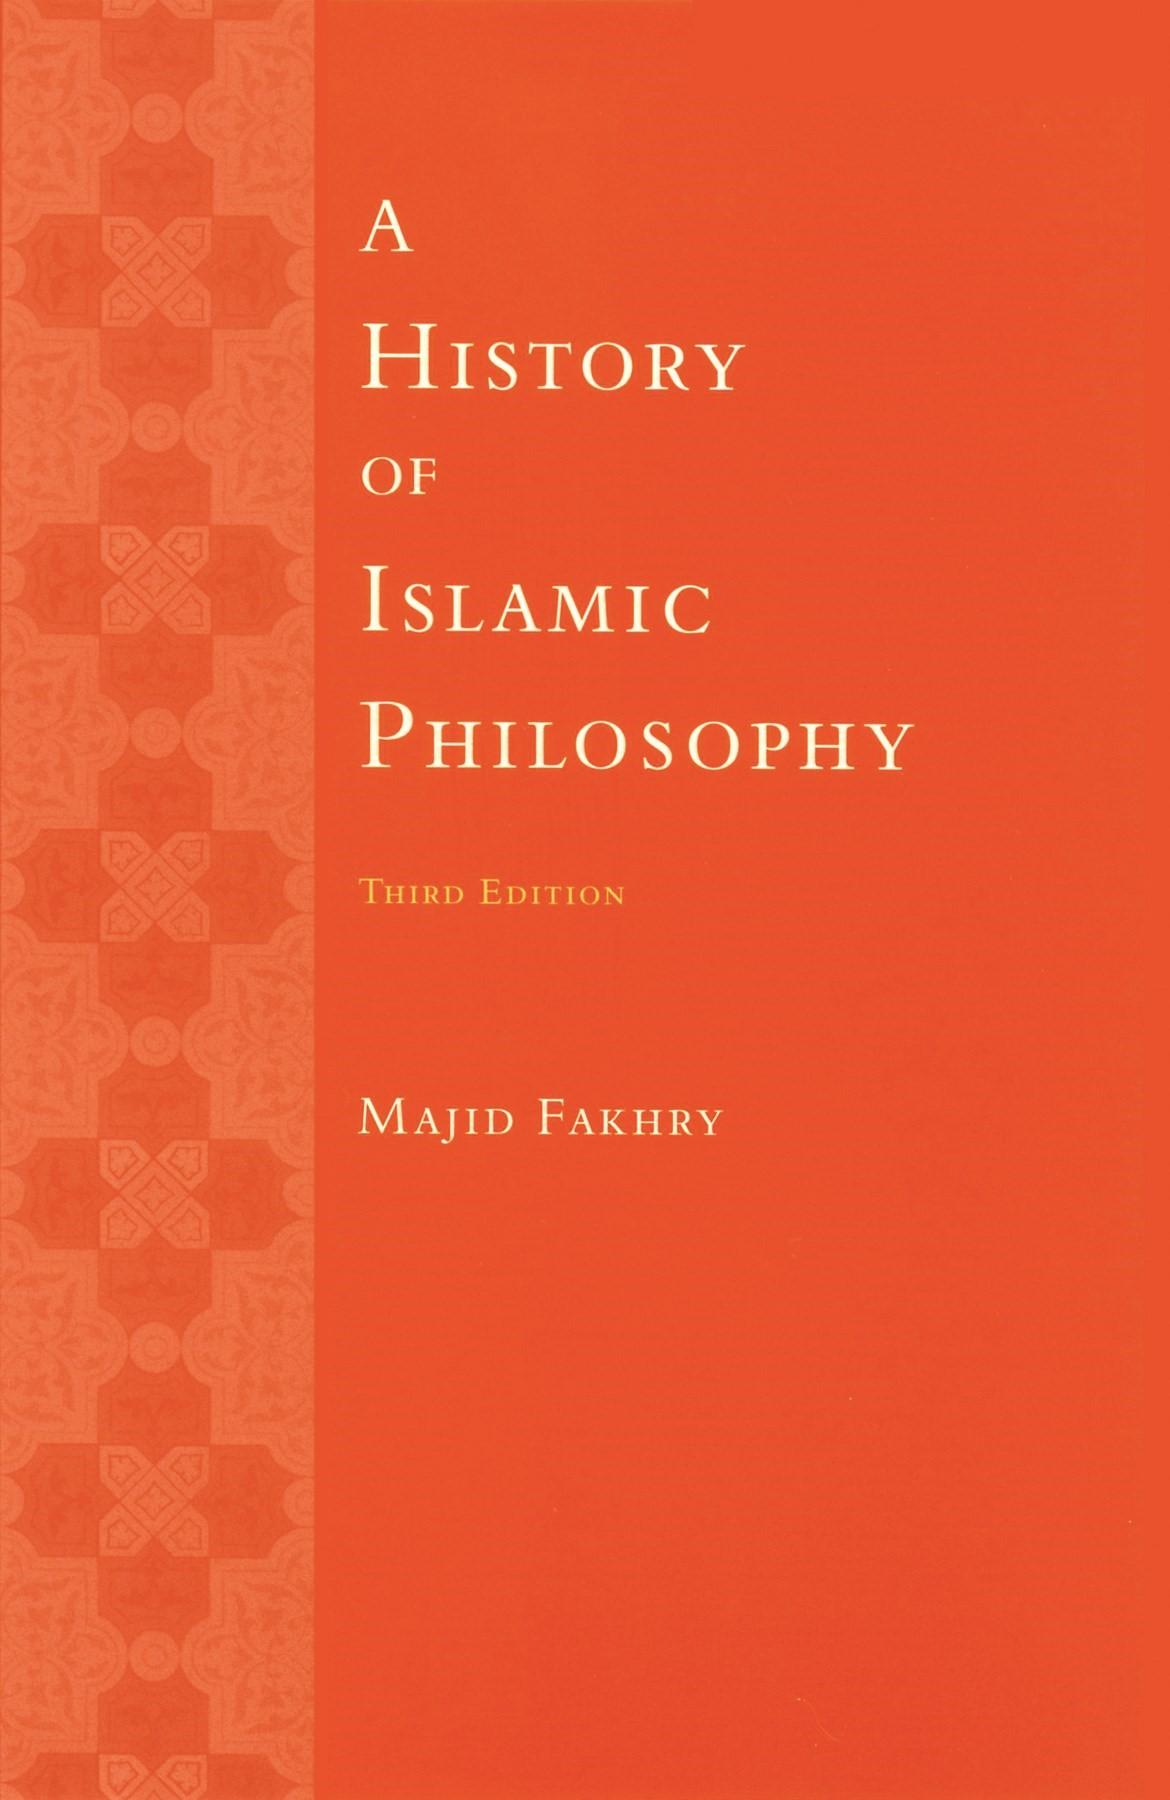 Abbildung von Fakhry | A History of Islamic Philosophy | third edition | 2004